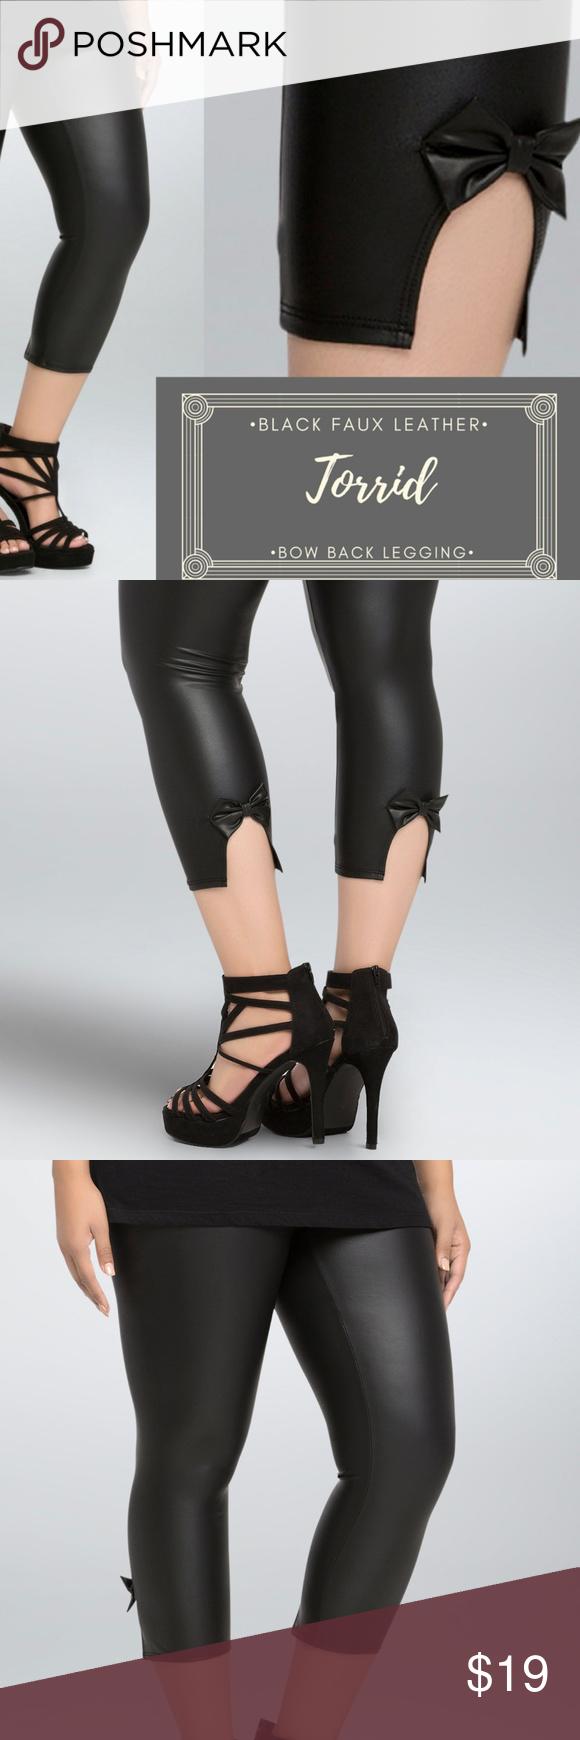 015076e8038c13 NWOTs Torrid Faux Leather Bow Back Leggings 3X blk NWOTs Torrid Faux  Leather Bow Back Leggings